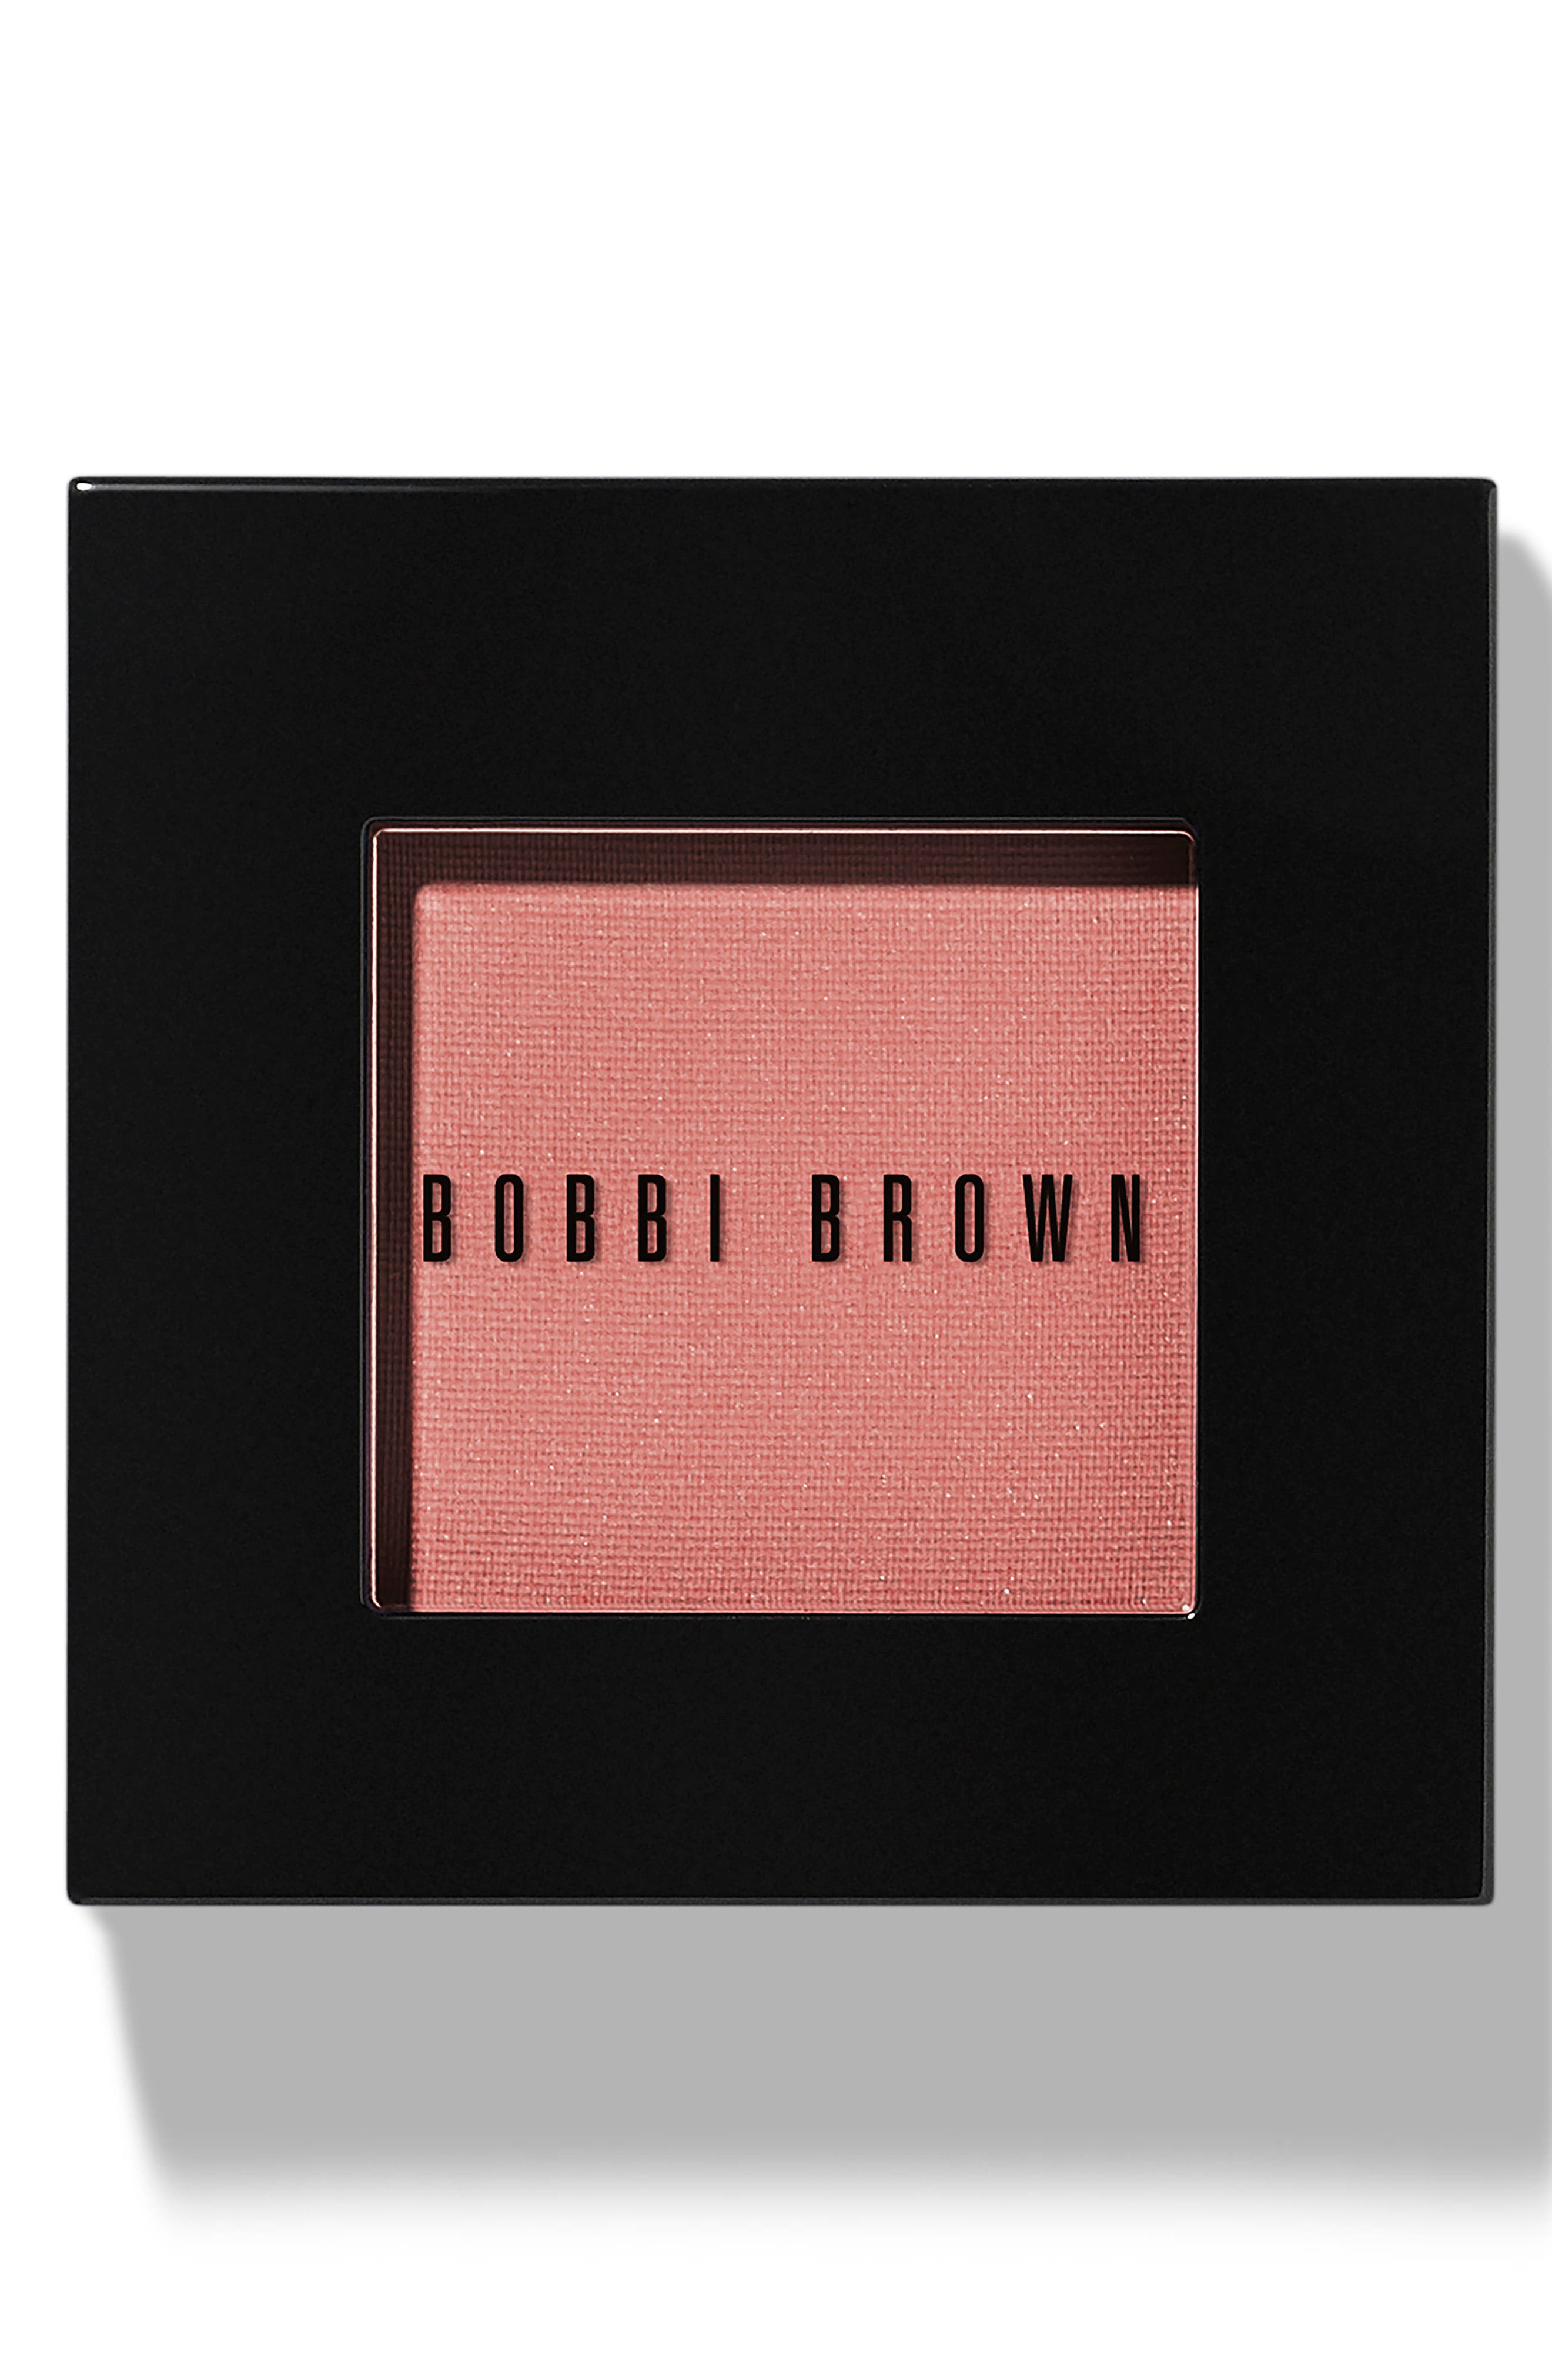 Cheeks Bobbi Brown Makeup Nordstrom Illuminating Cheek Palette Limited Edition